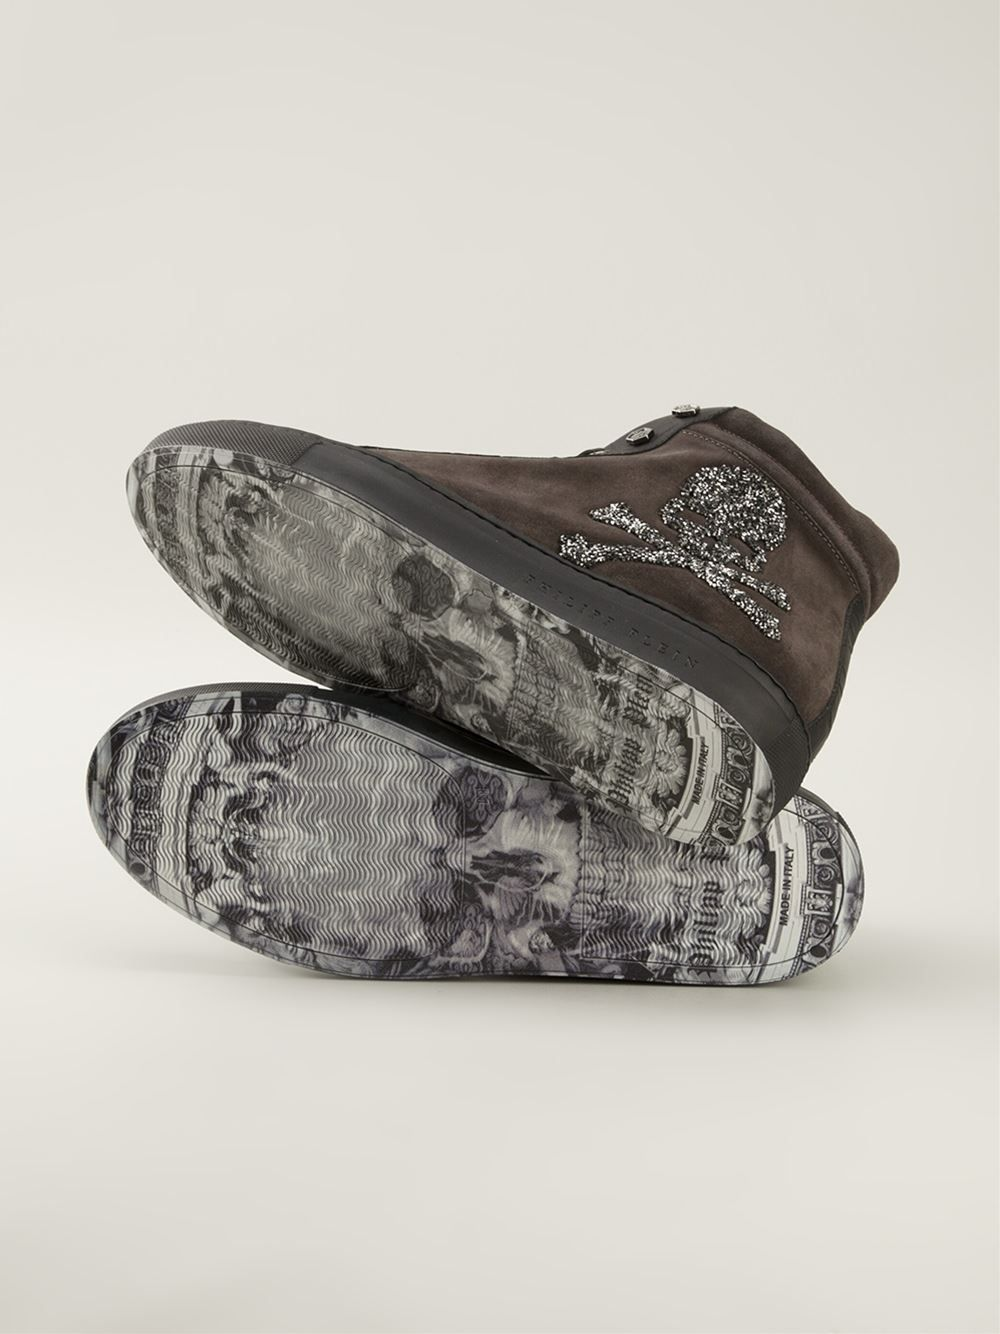 Brown sneakers lyst.com